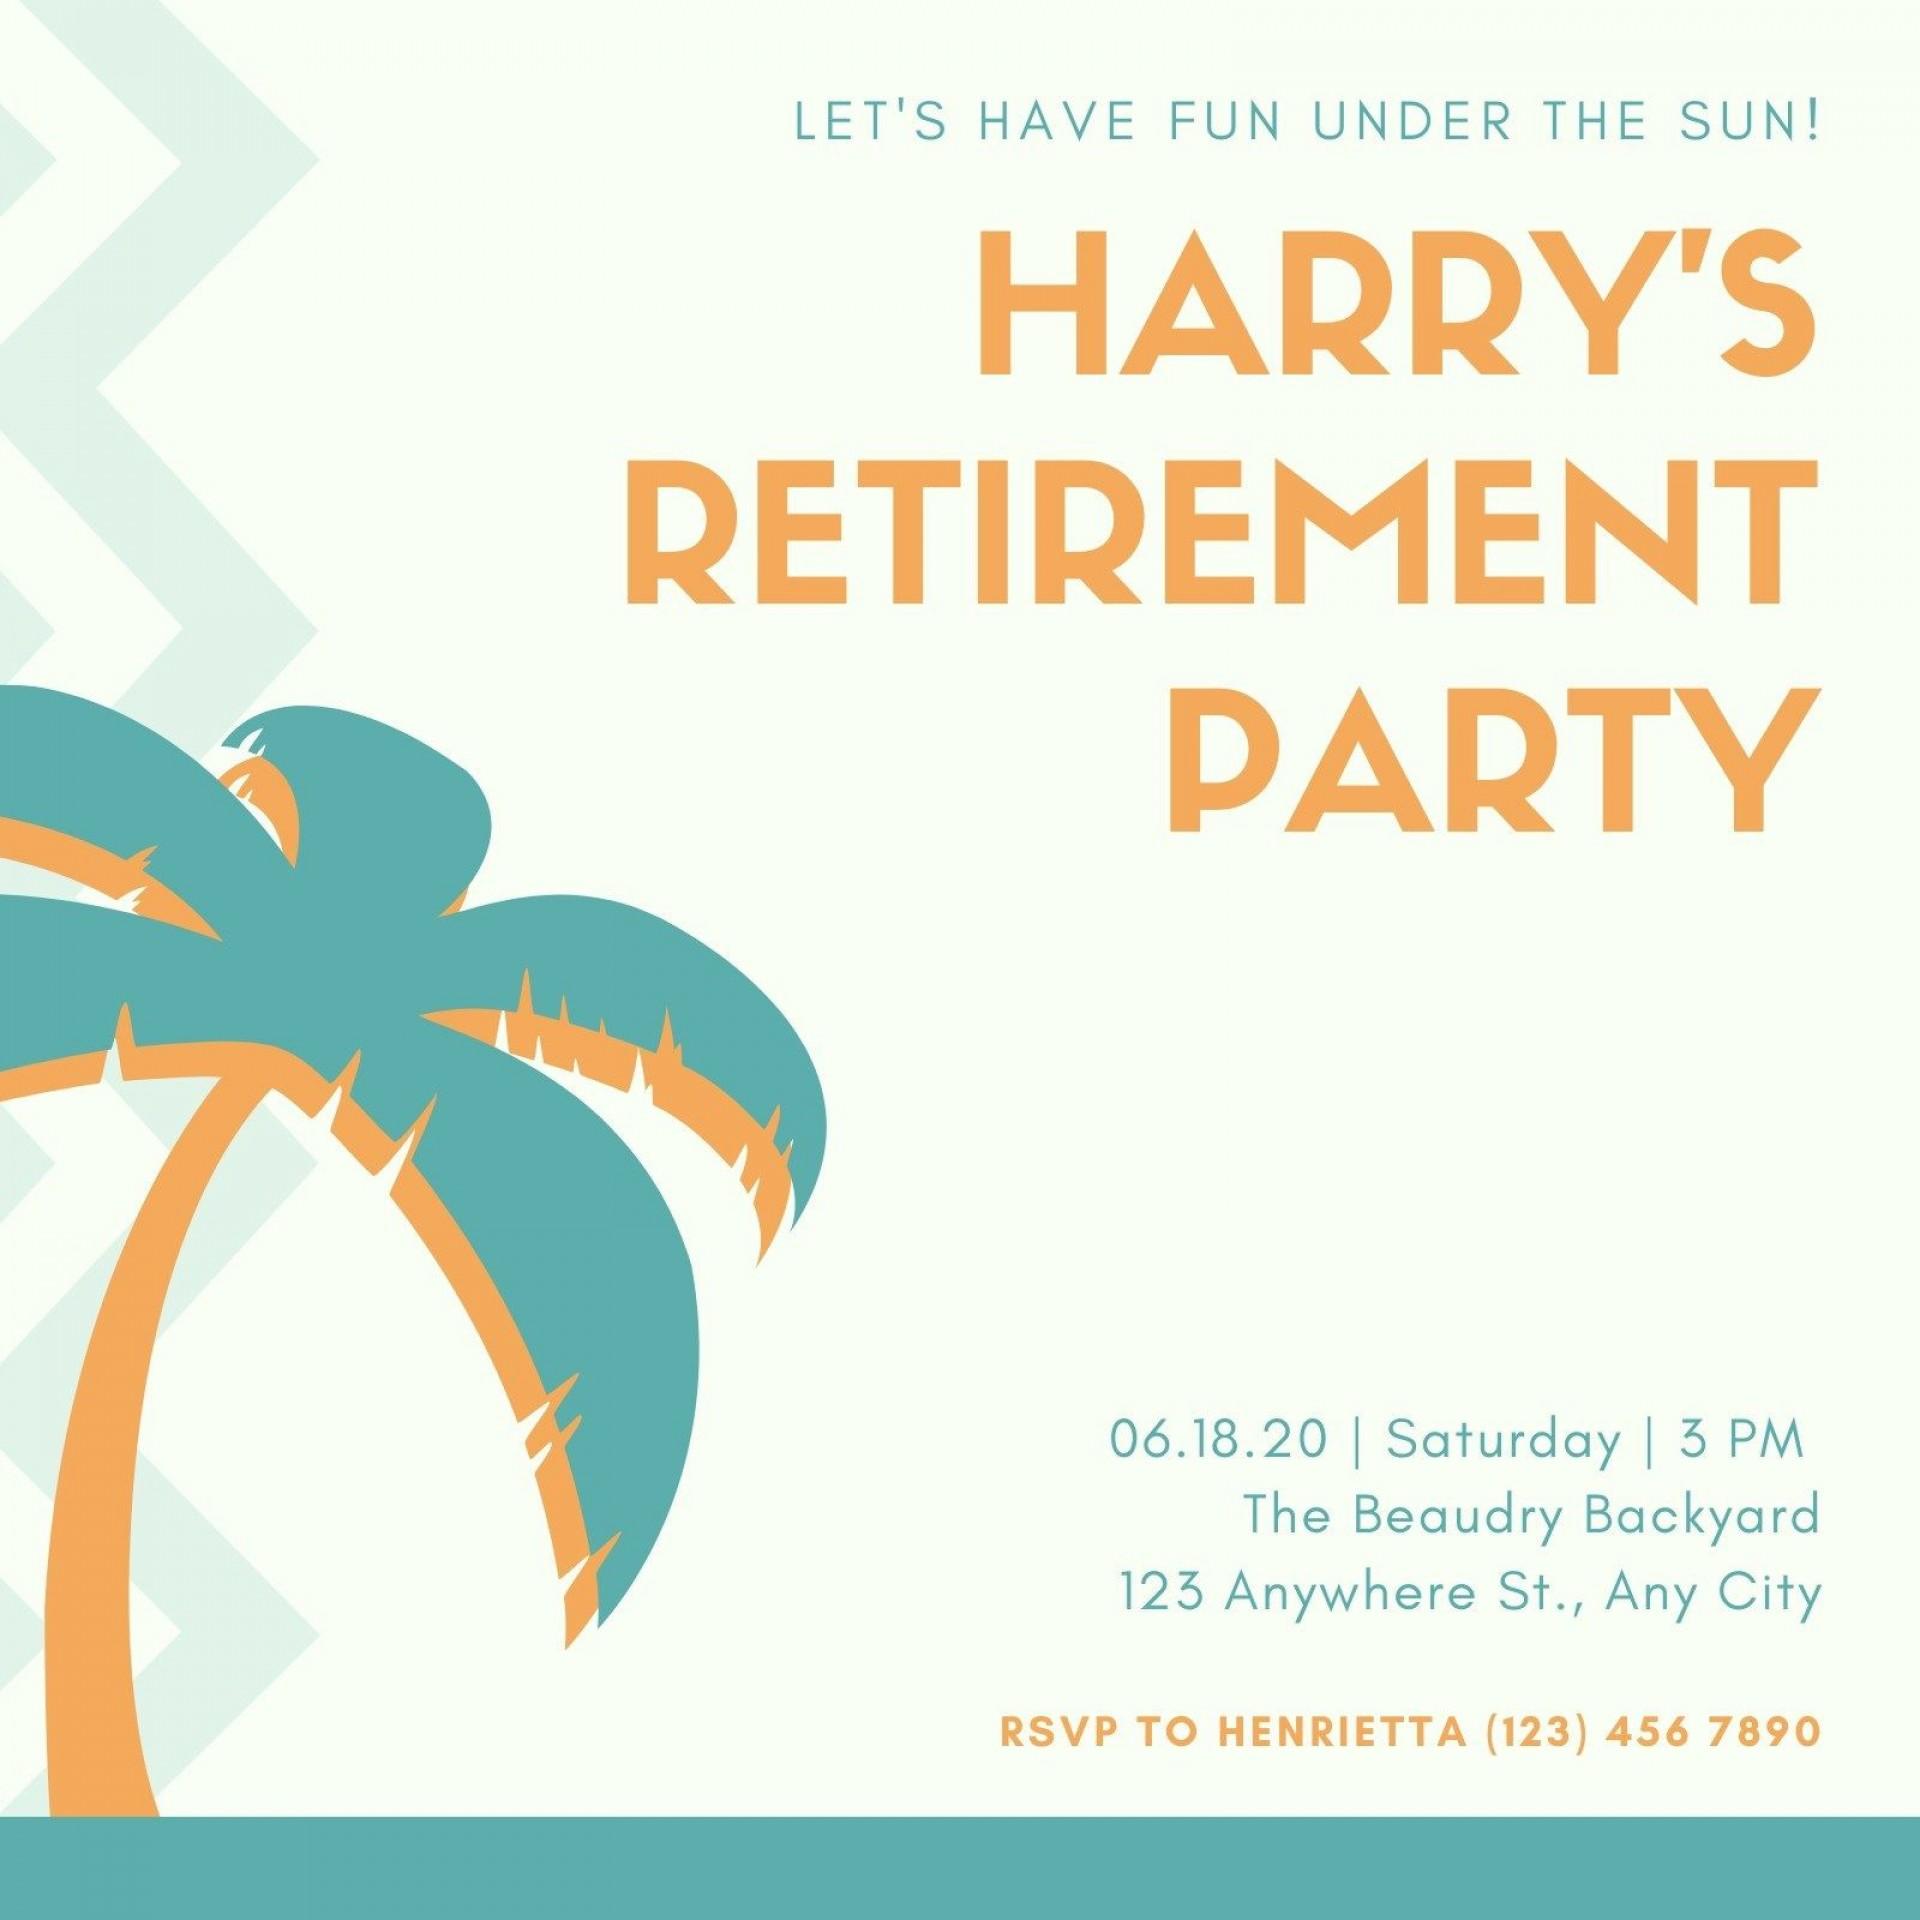 006 Beautiful Retirement Party Invite Template Design  Invitation Online M Word Free1920